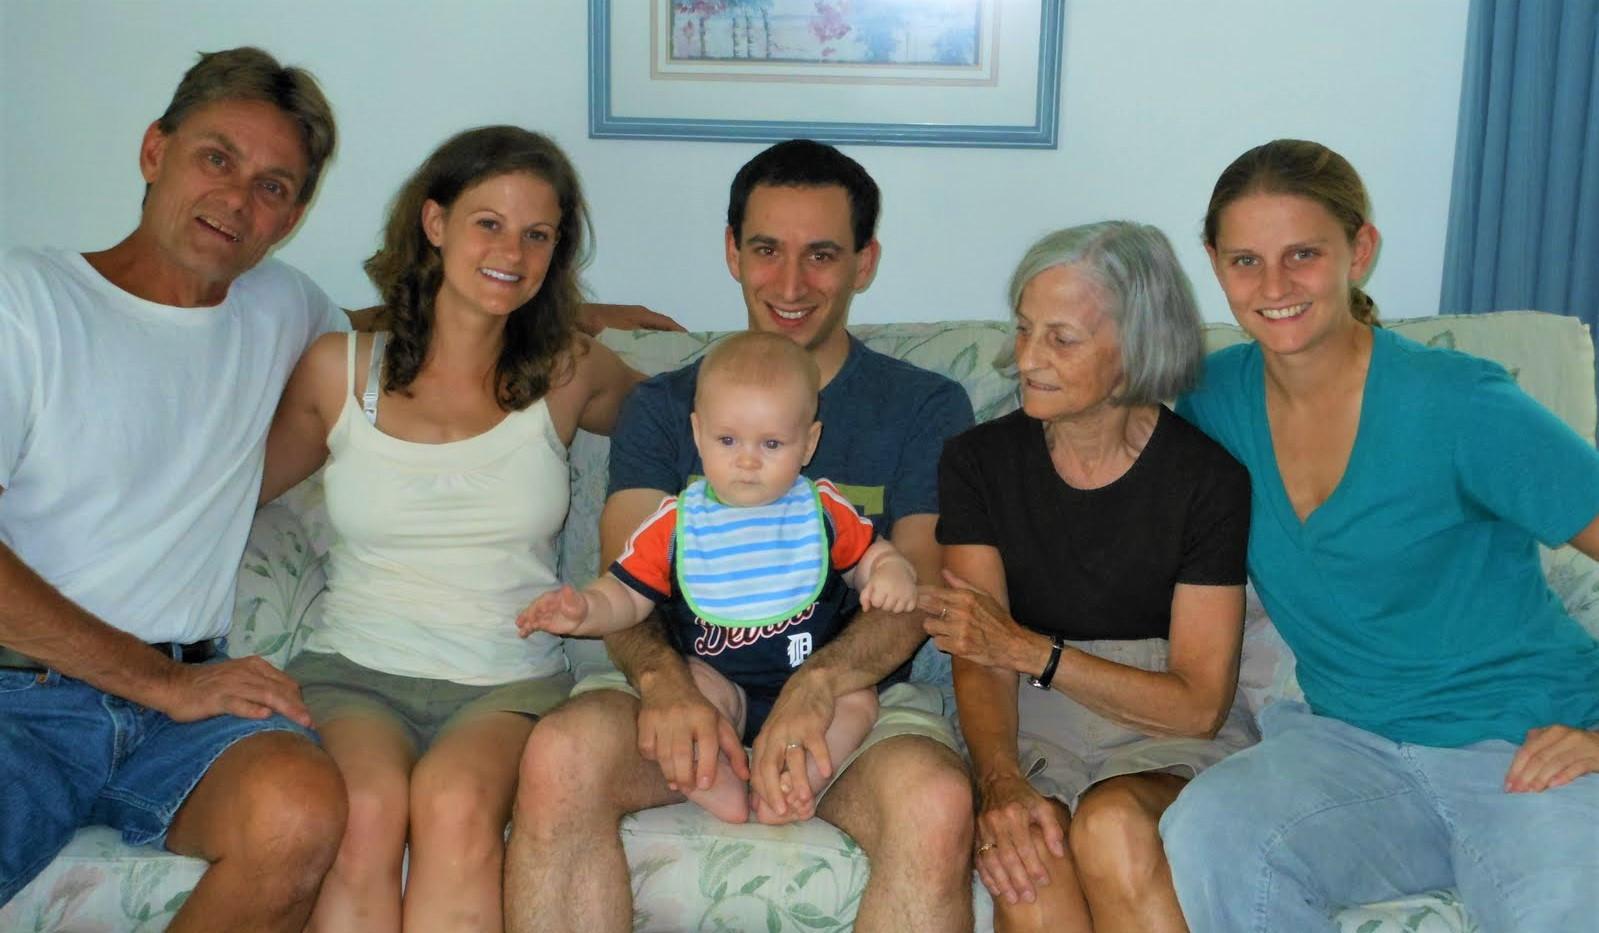 Randy Hudson Family Photo #3.JPG